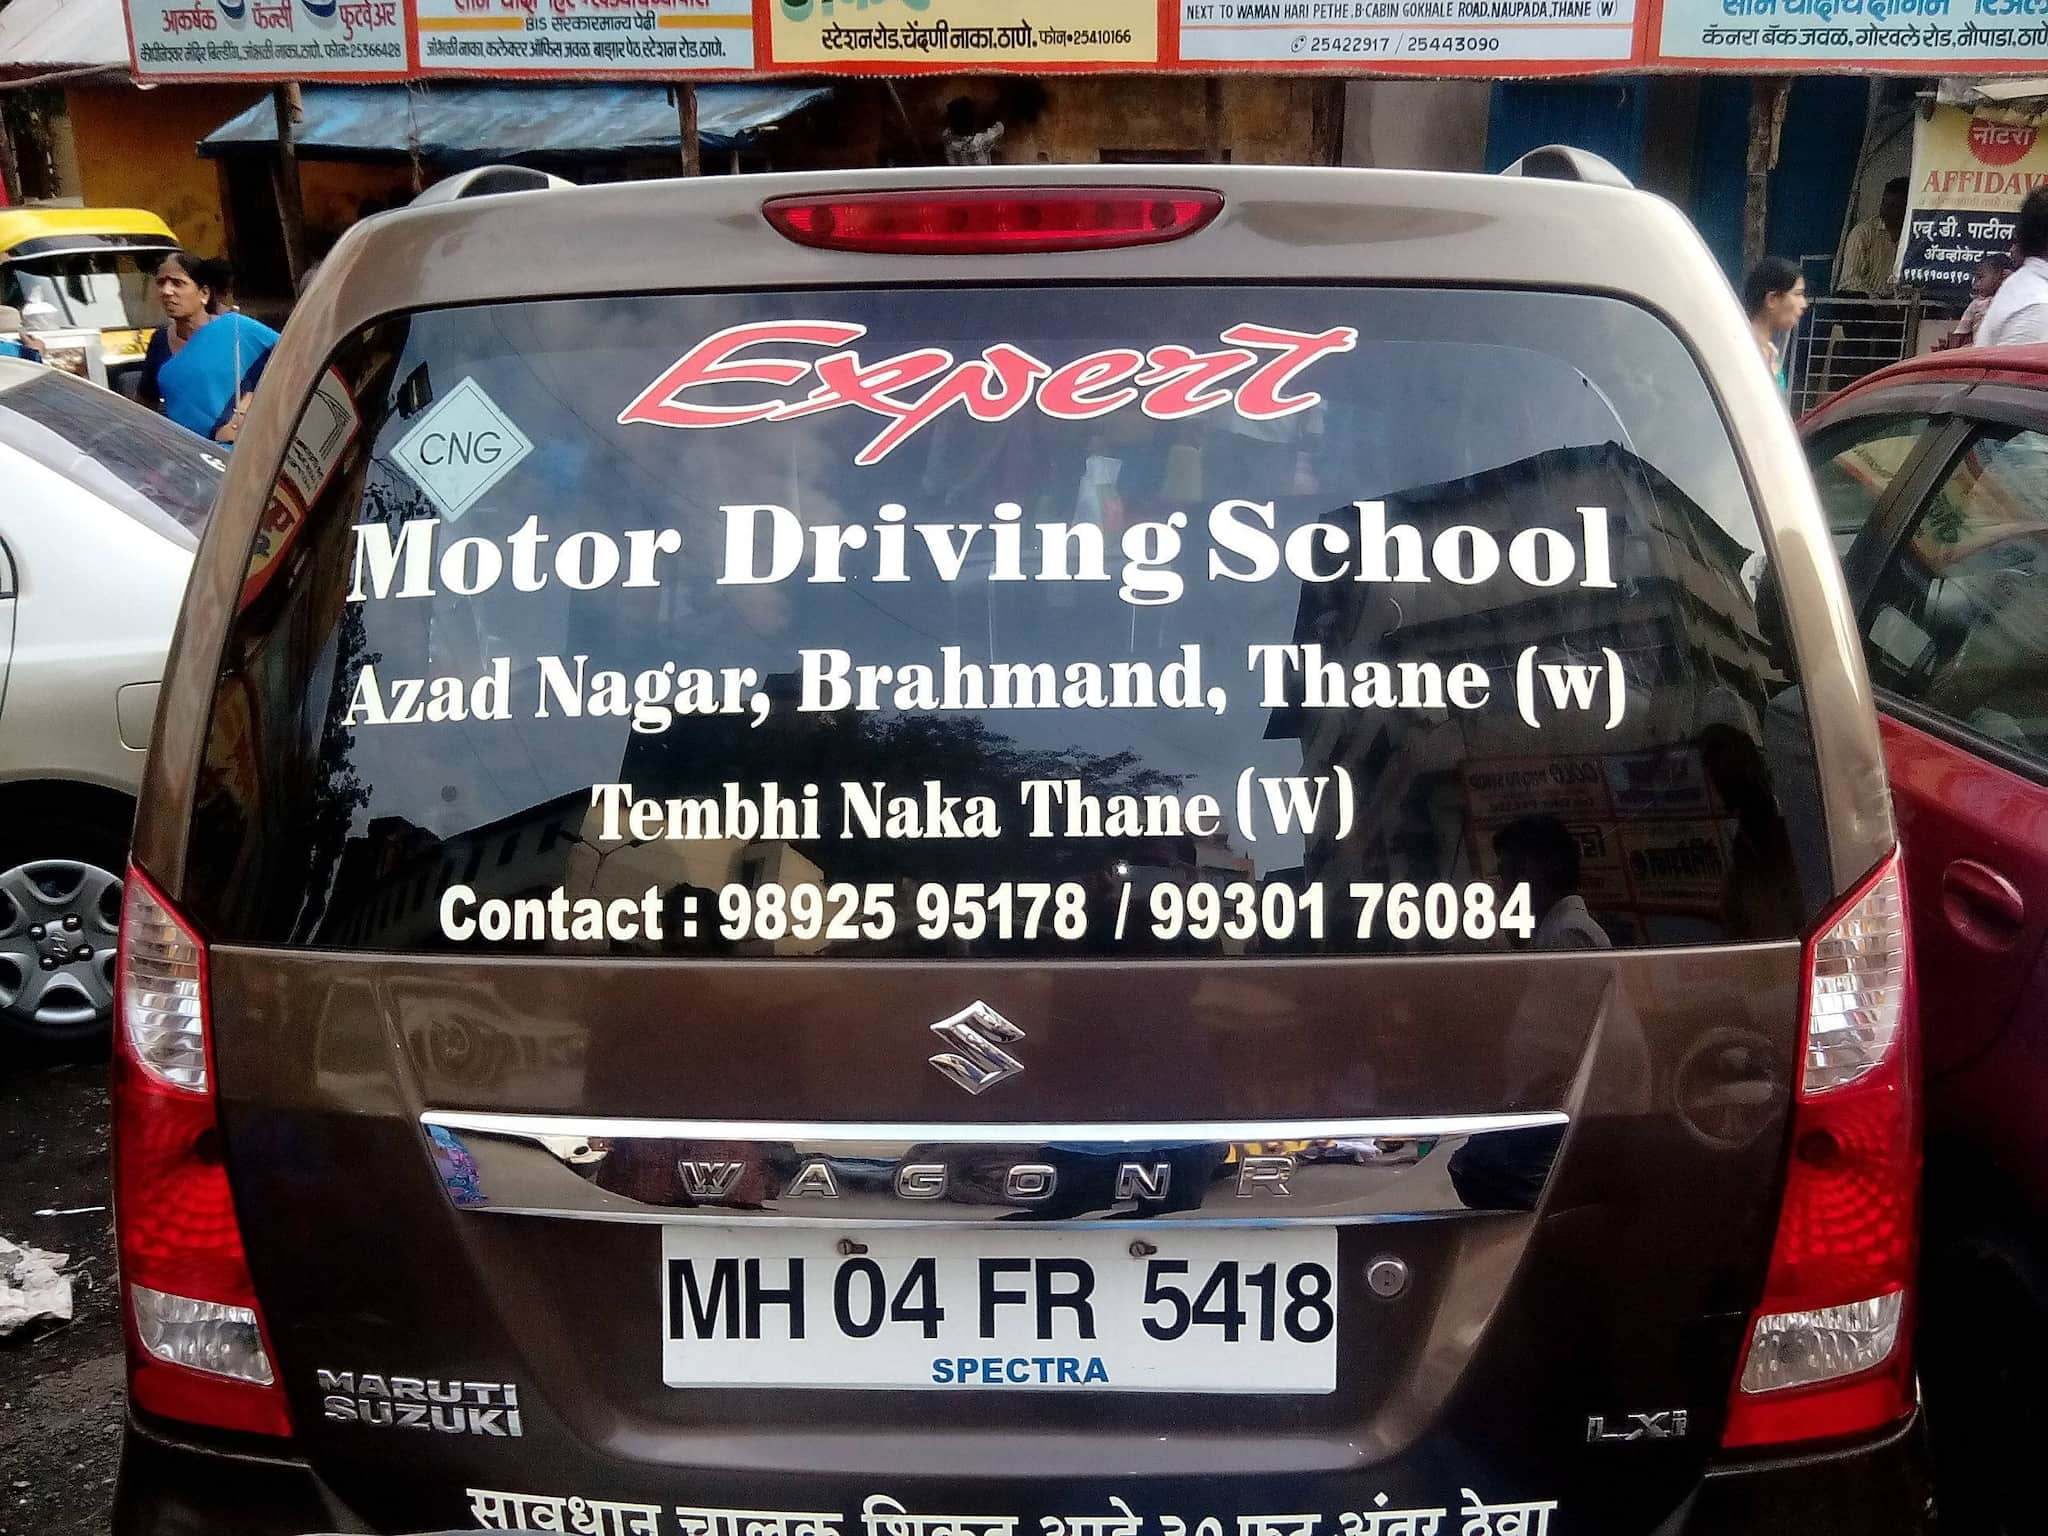 Expert Motor Driving School, Thane West - Motor Training Schools in Mumbai - Justdial